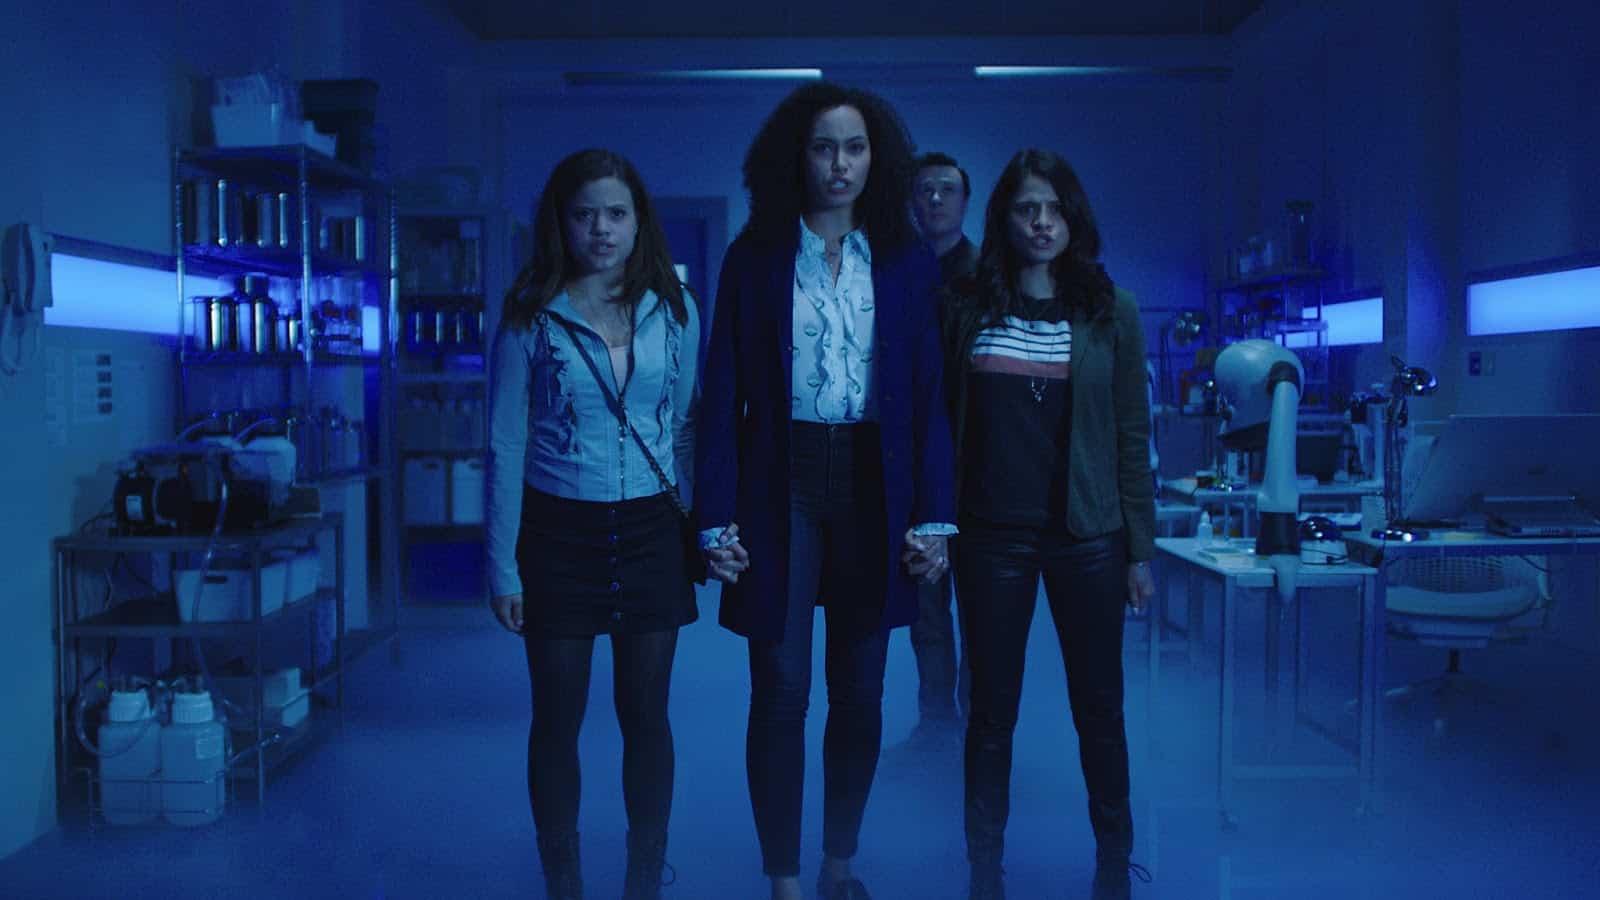 Globoplay: confira o que chega em agosto de 2021 ao streaming brasileiro